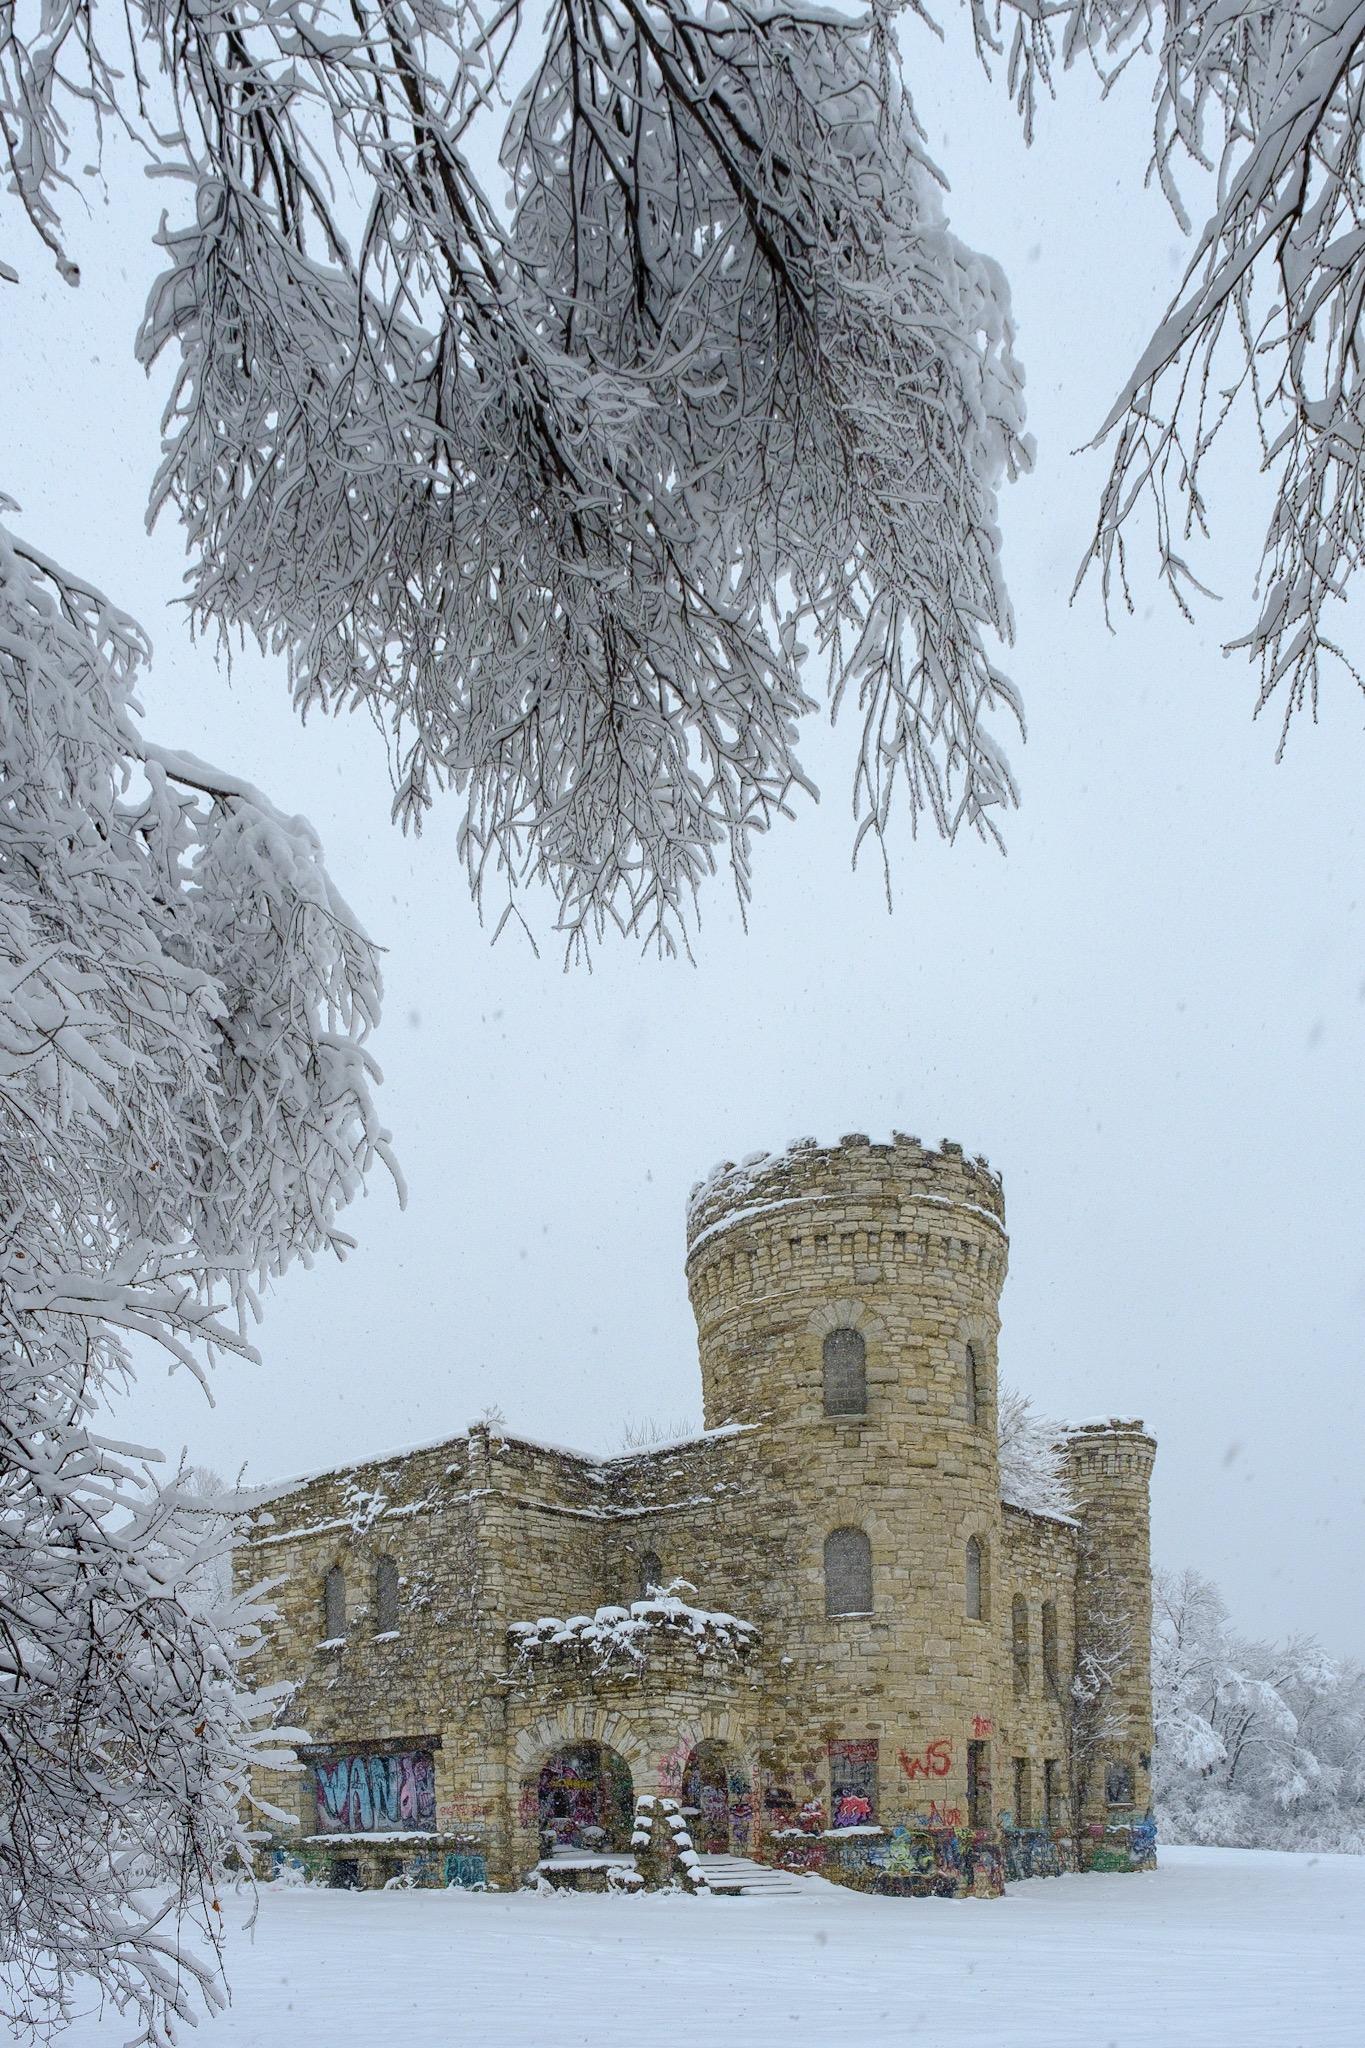 SnowCastle-Kansas-City.jpg